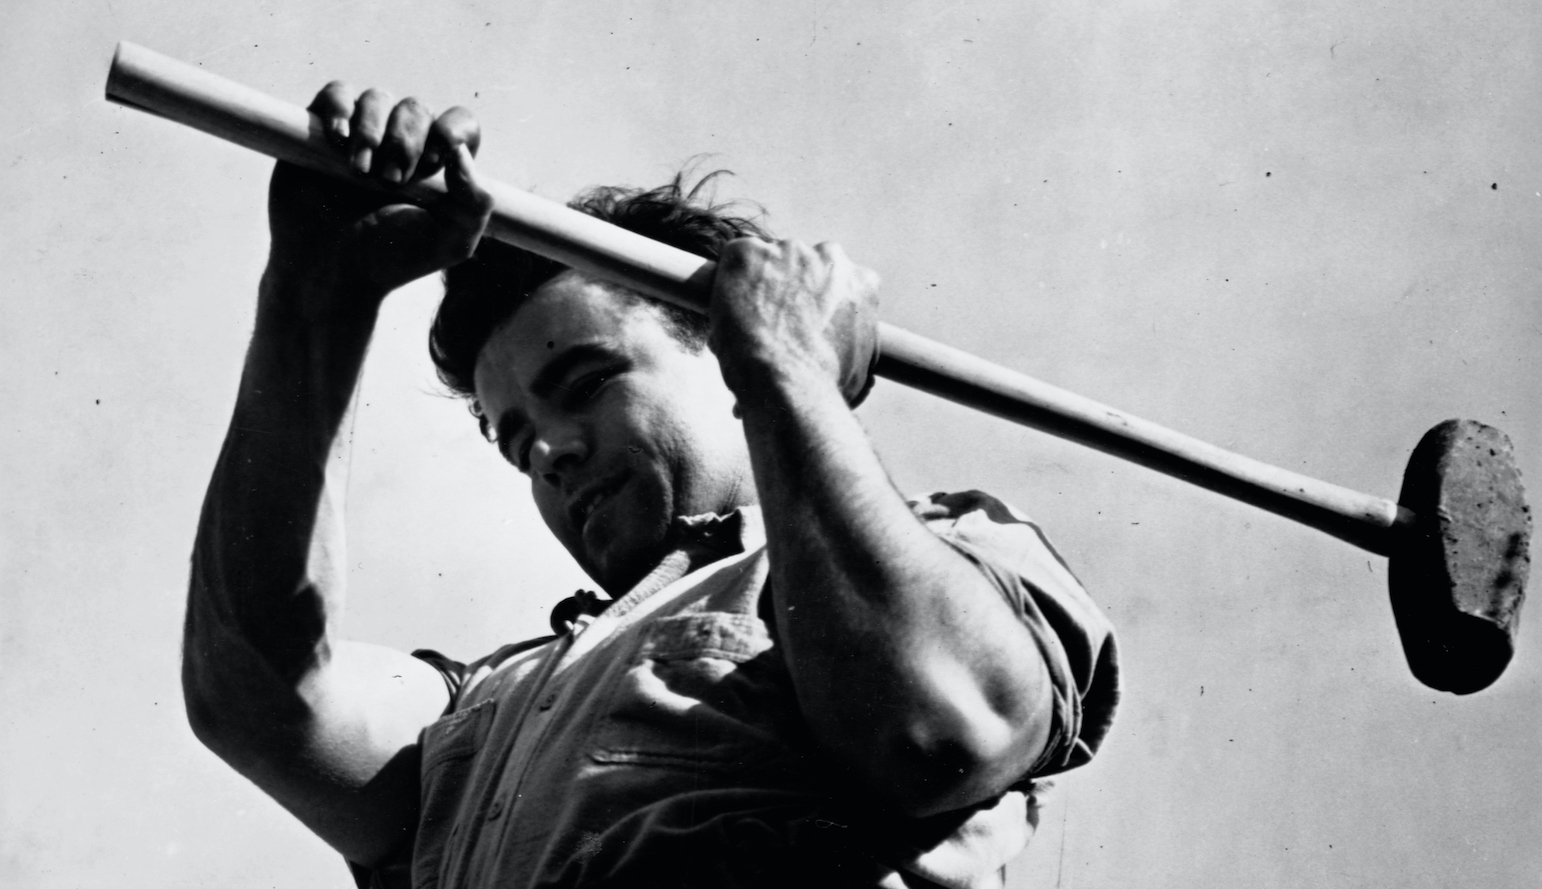 Man Swinging Sledge Hammer